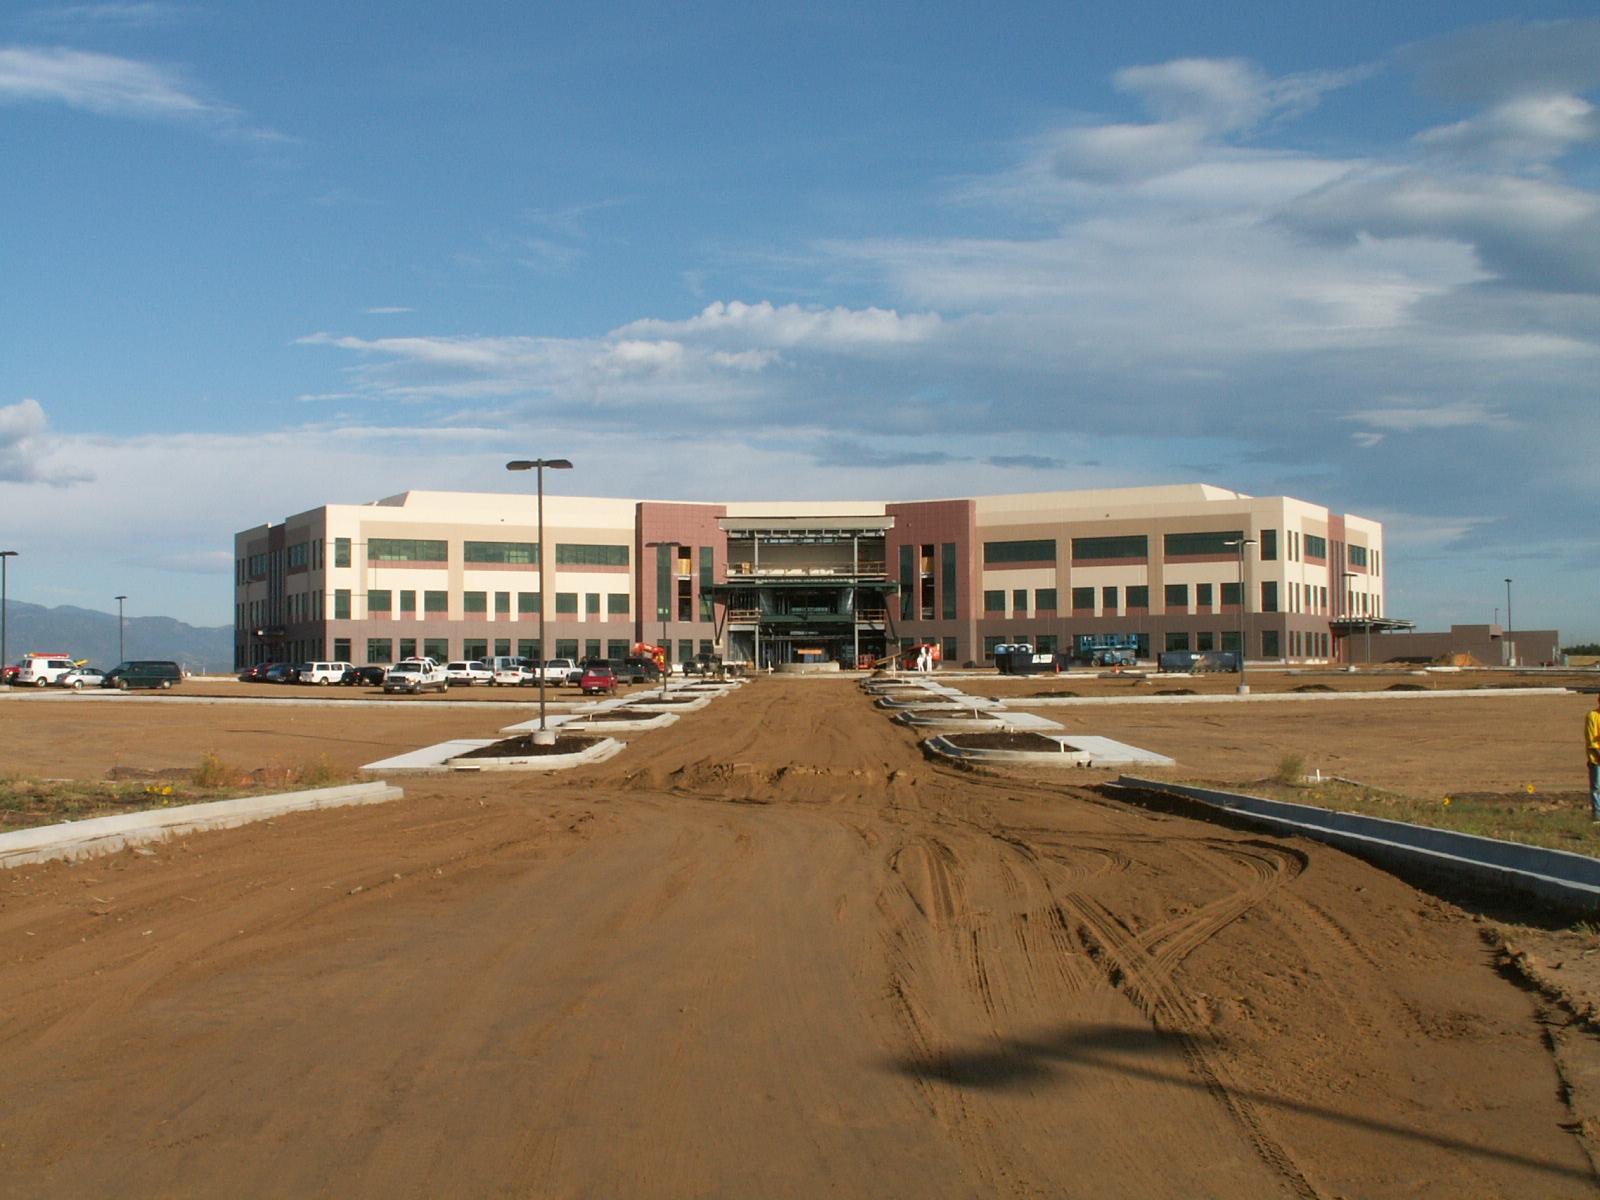 9-6-07 front of building 110.JPG